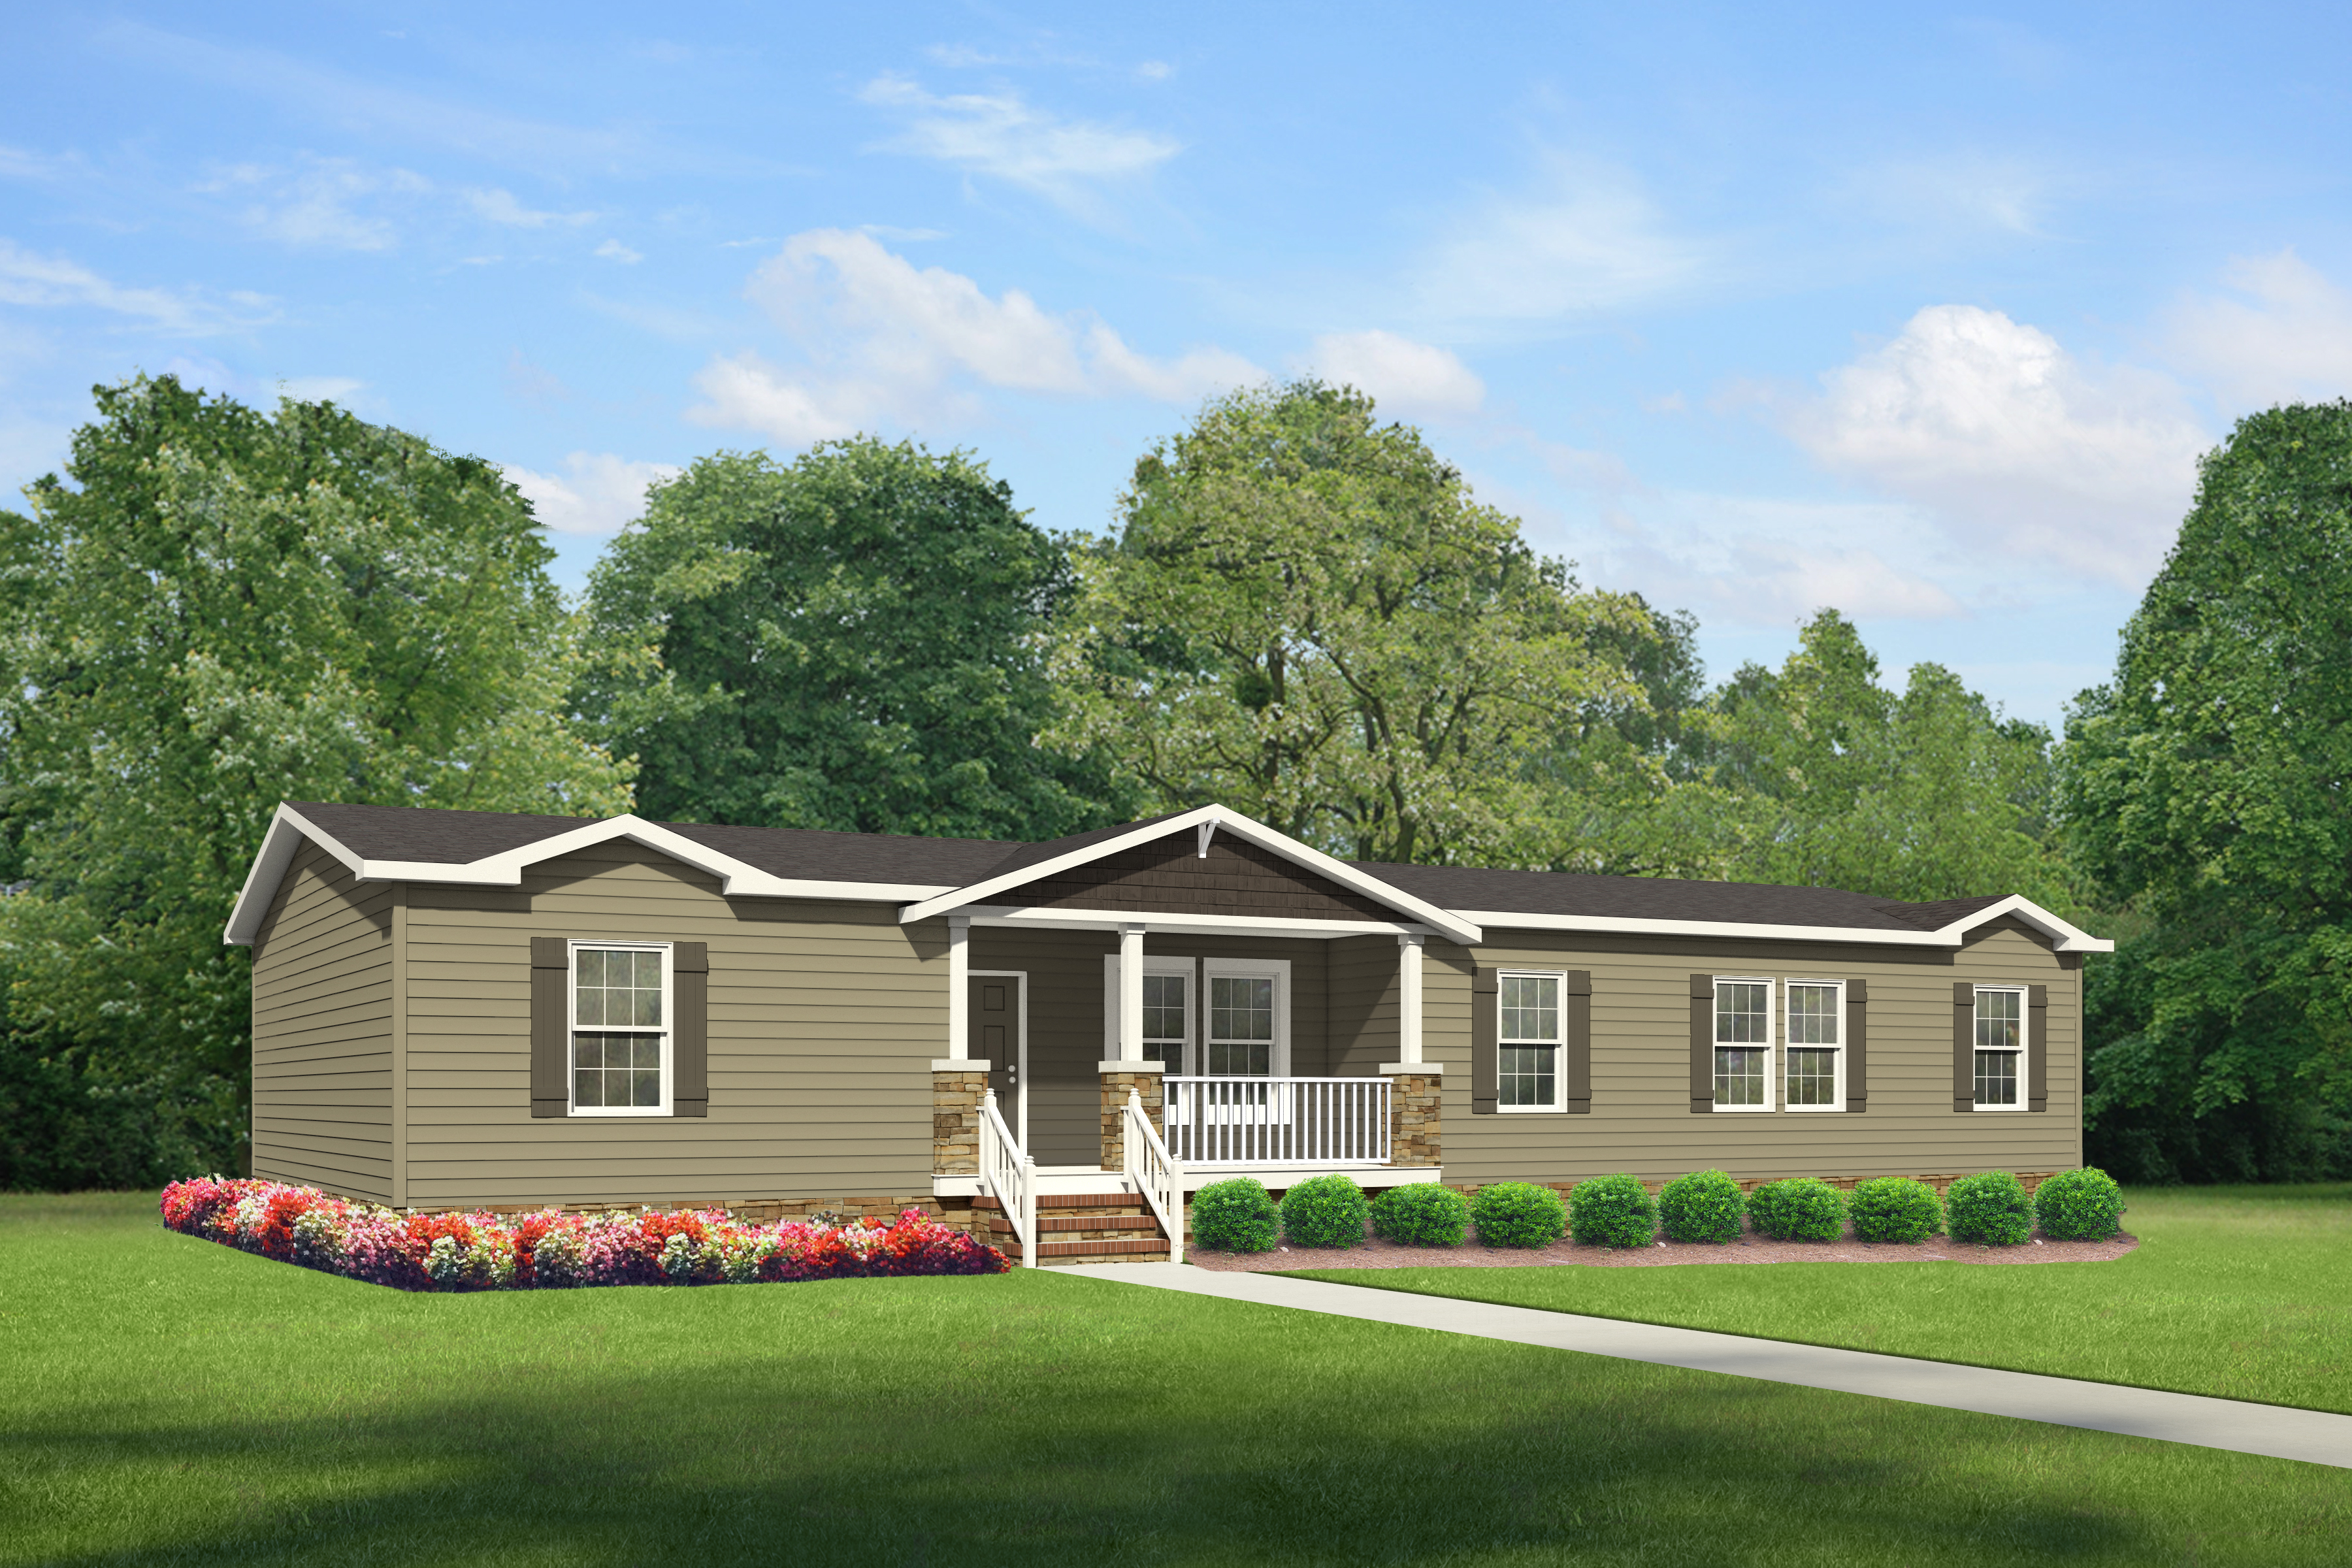 Clayton Homes image 2